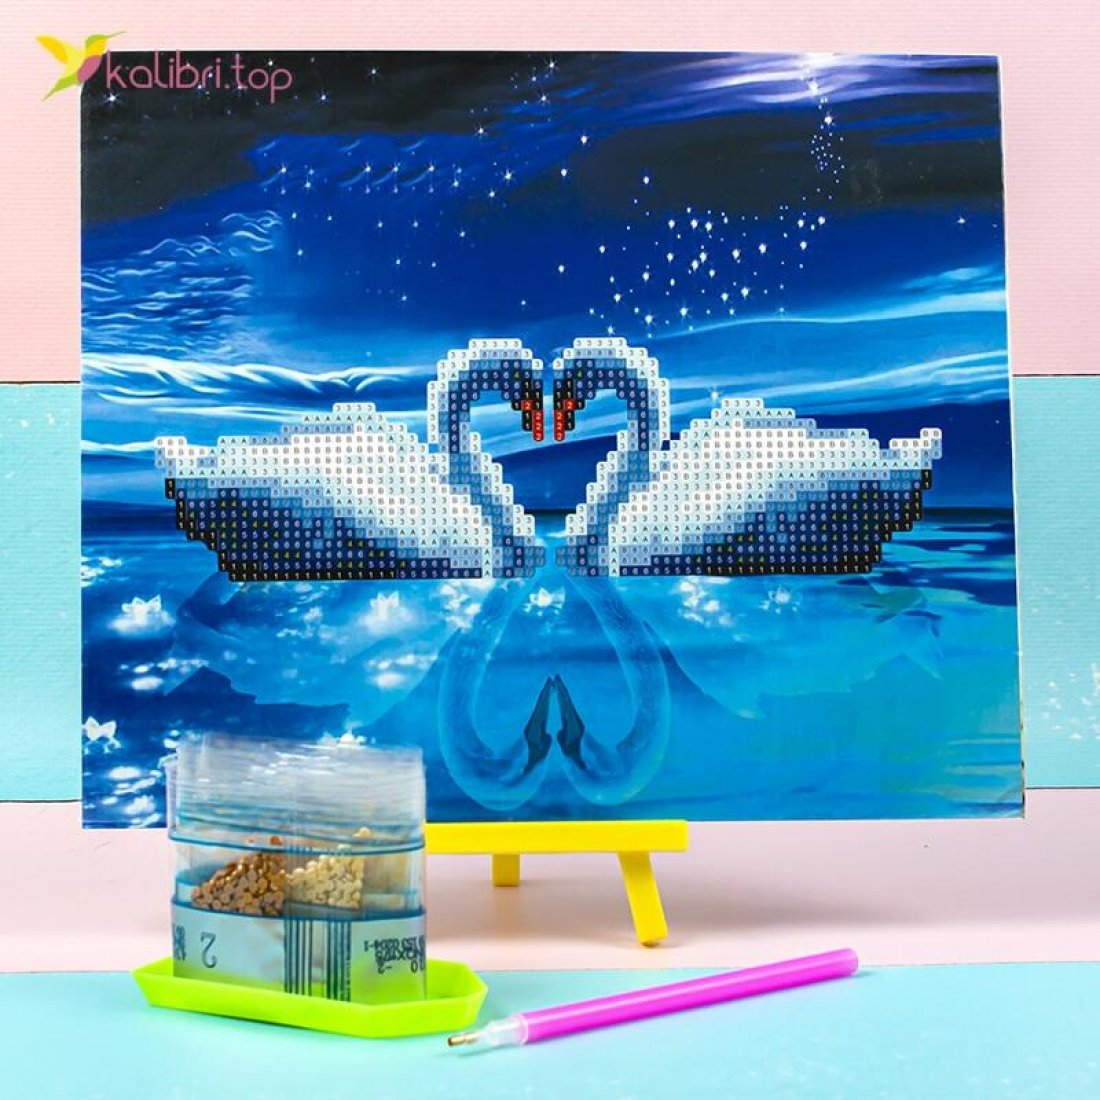 Алмазная мозаика по номерам Лебеди 21*25 см оптом фото 047